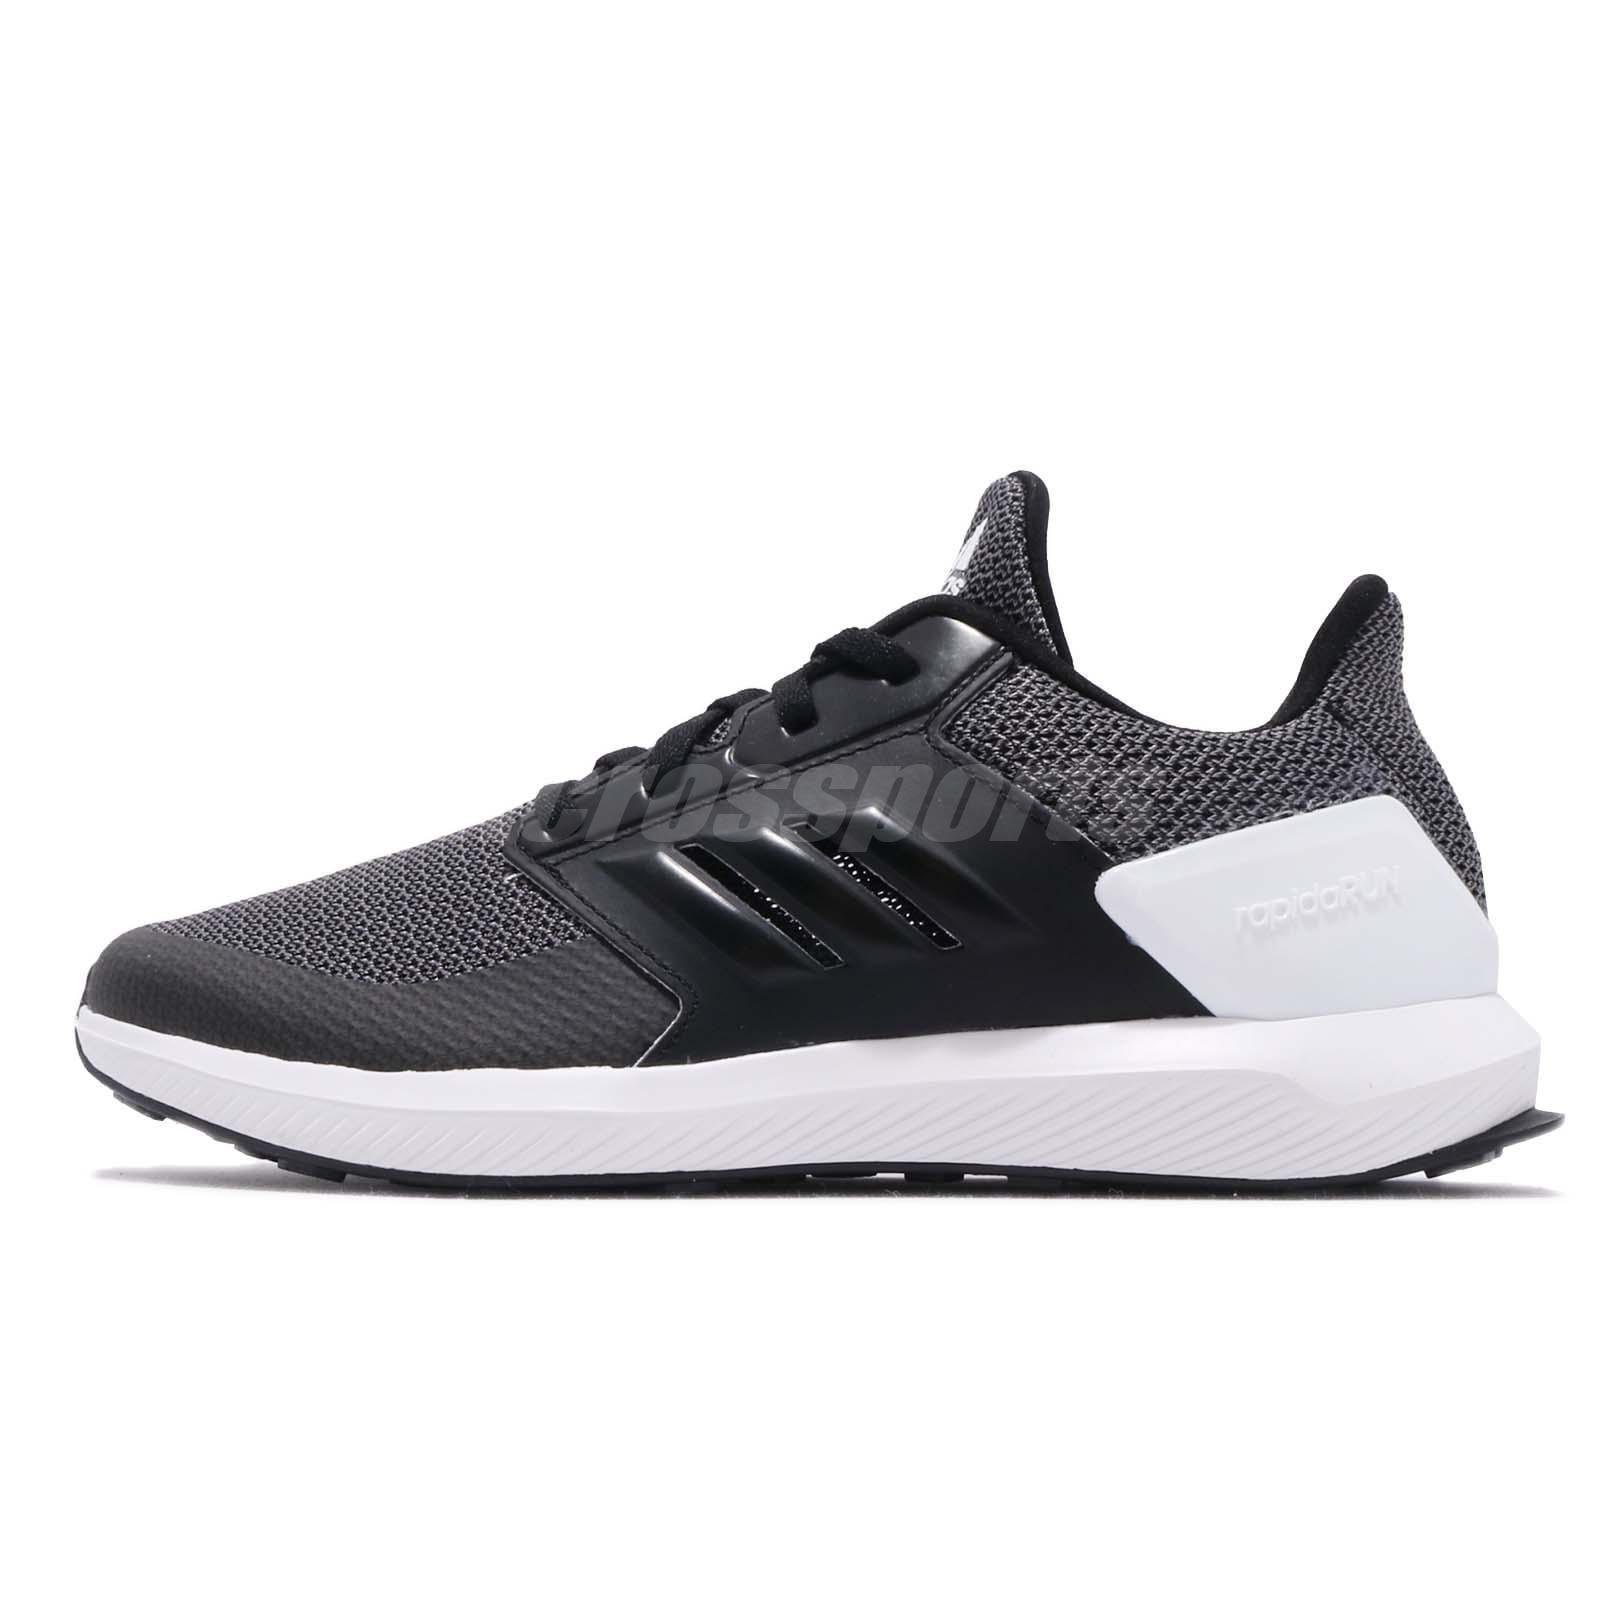 1be5f6ff9 adidas RapidaRun K Black Grey White Kid Preschool Running Shoes Sneakers  F35888